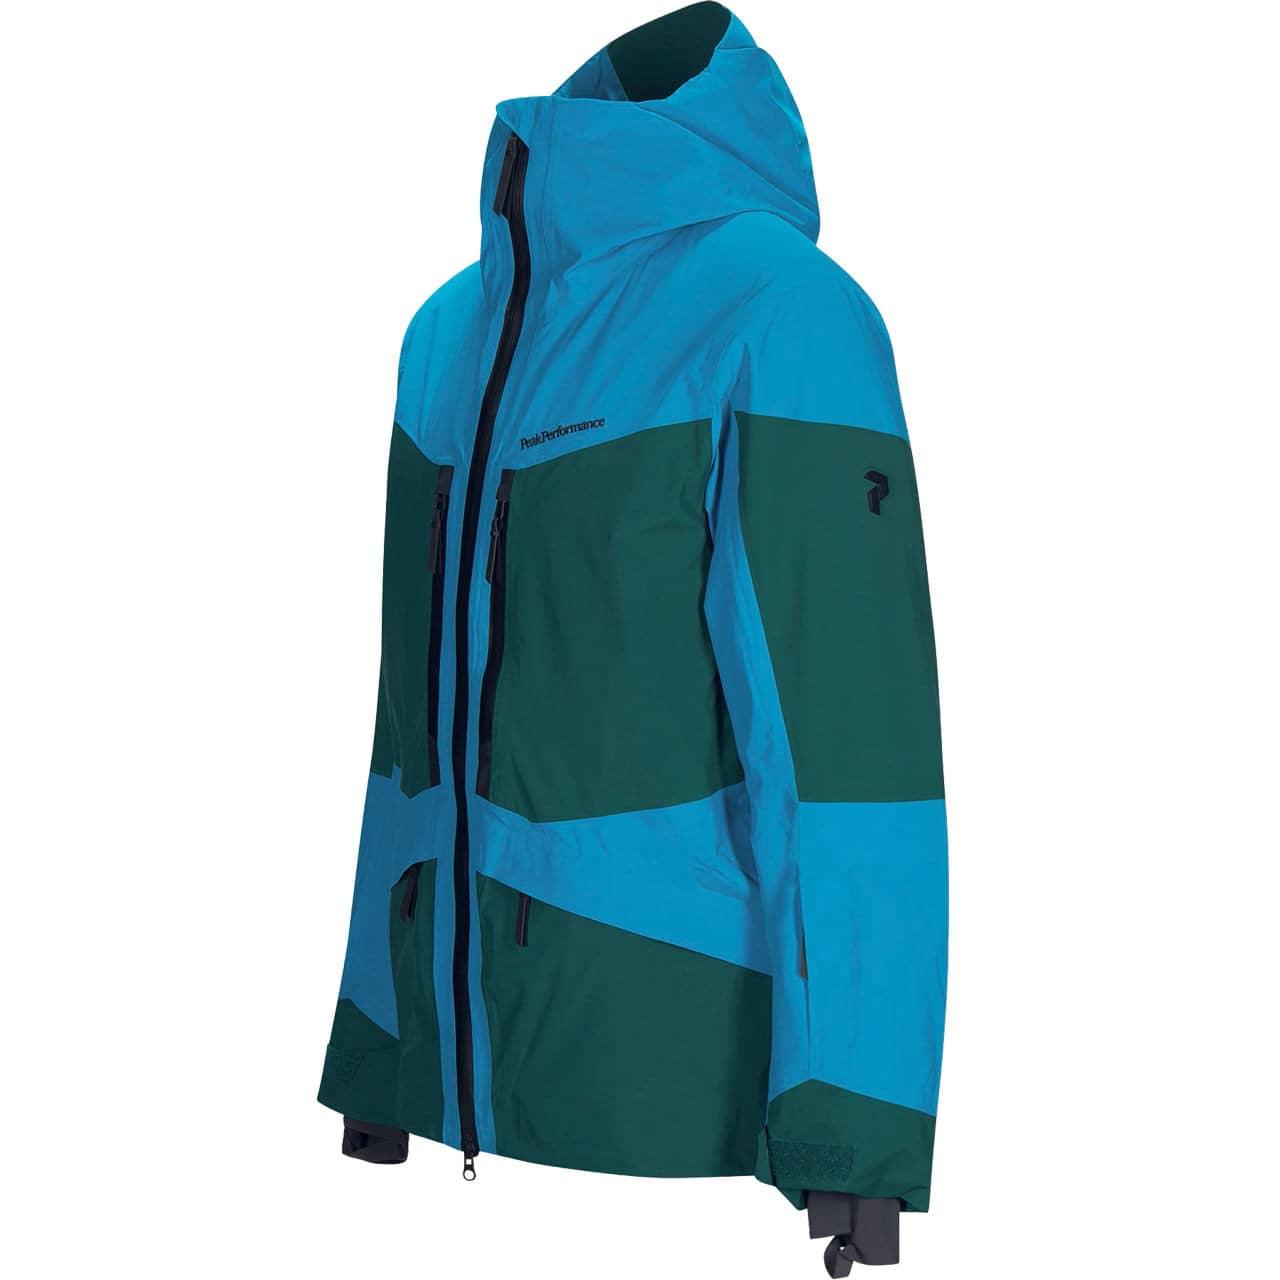 pretty nice e52e2 9744d Peak Performance Ski Shop - Produkte günstig online kaufen